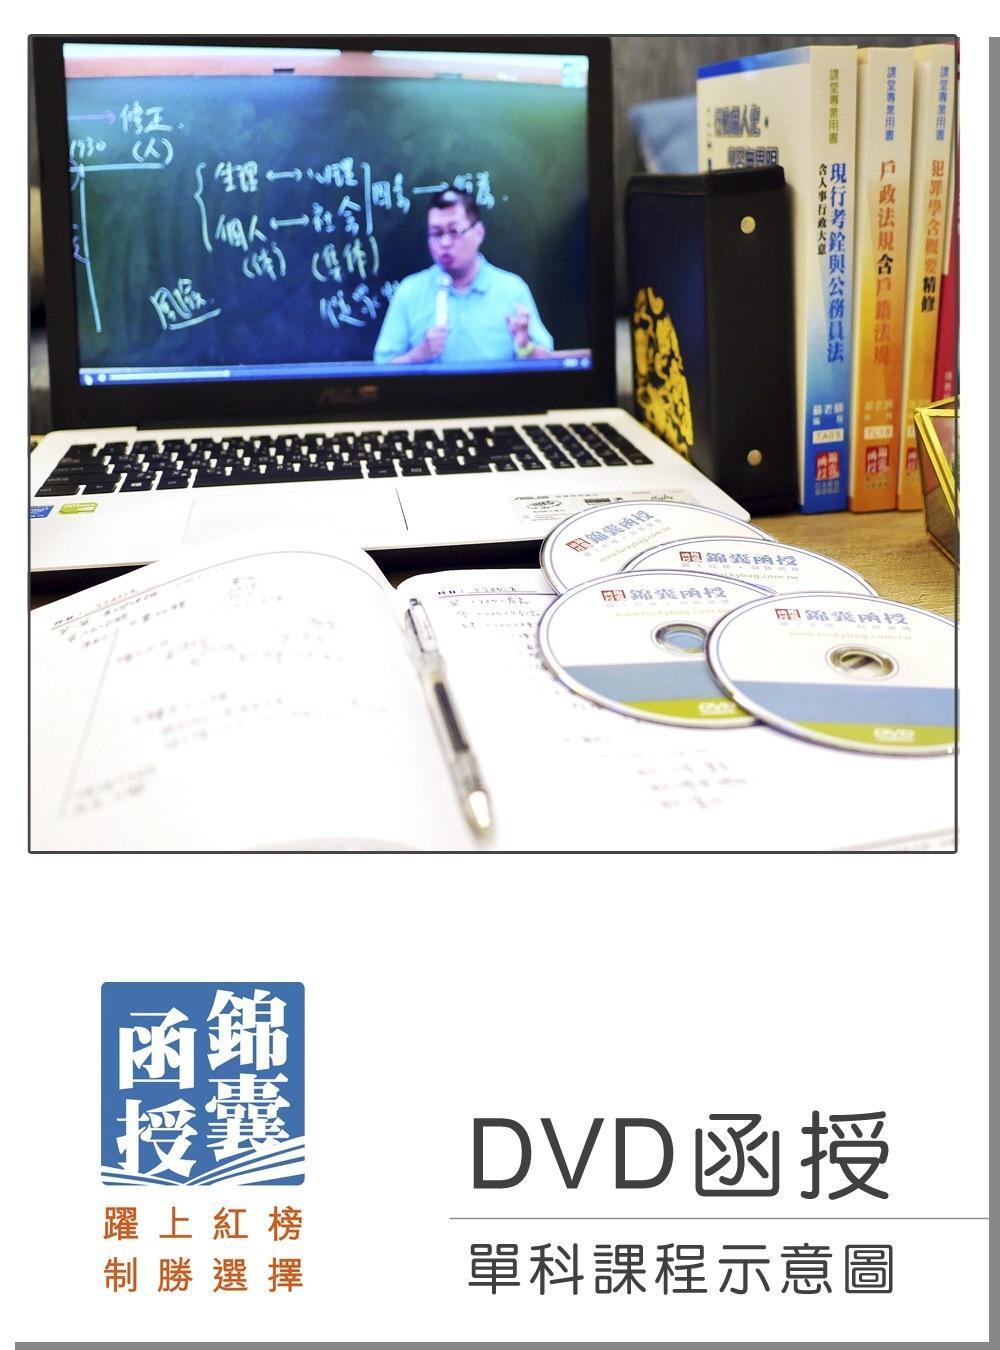 【DVD函授】軌道經營與管理:單科課程(107版)